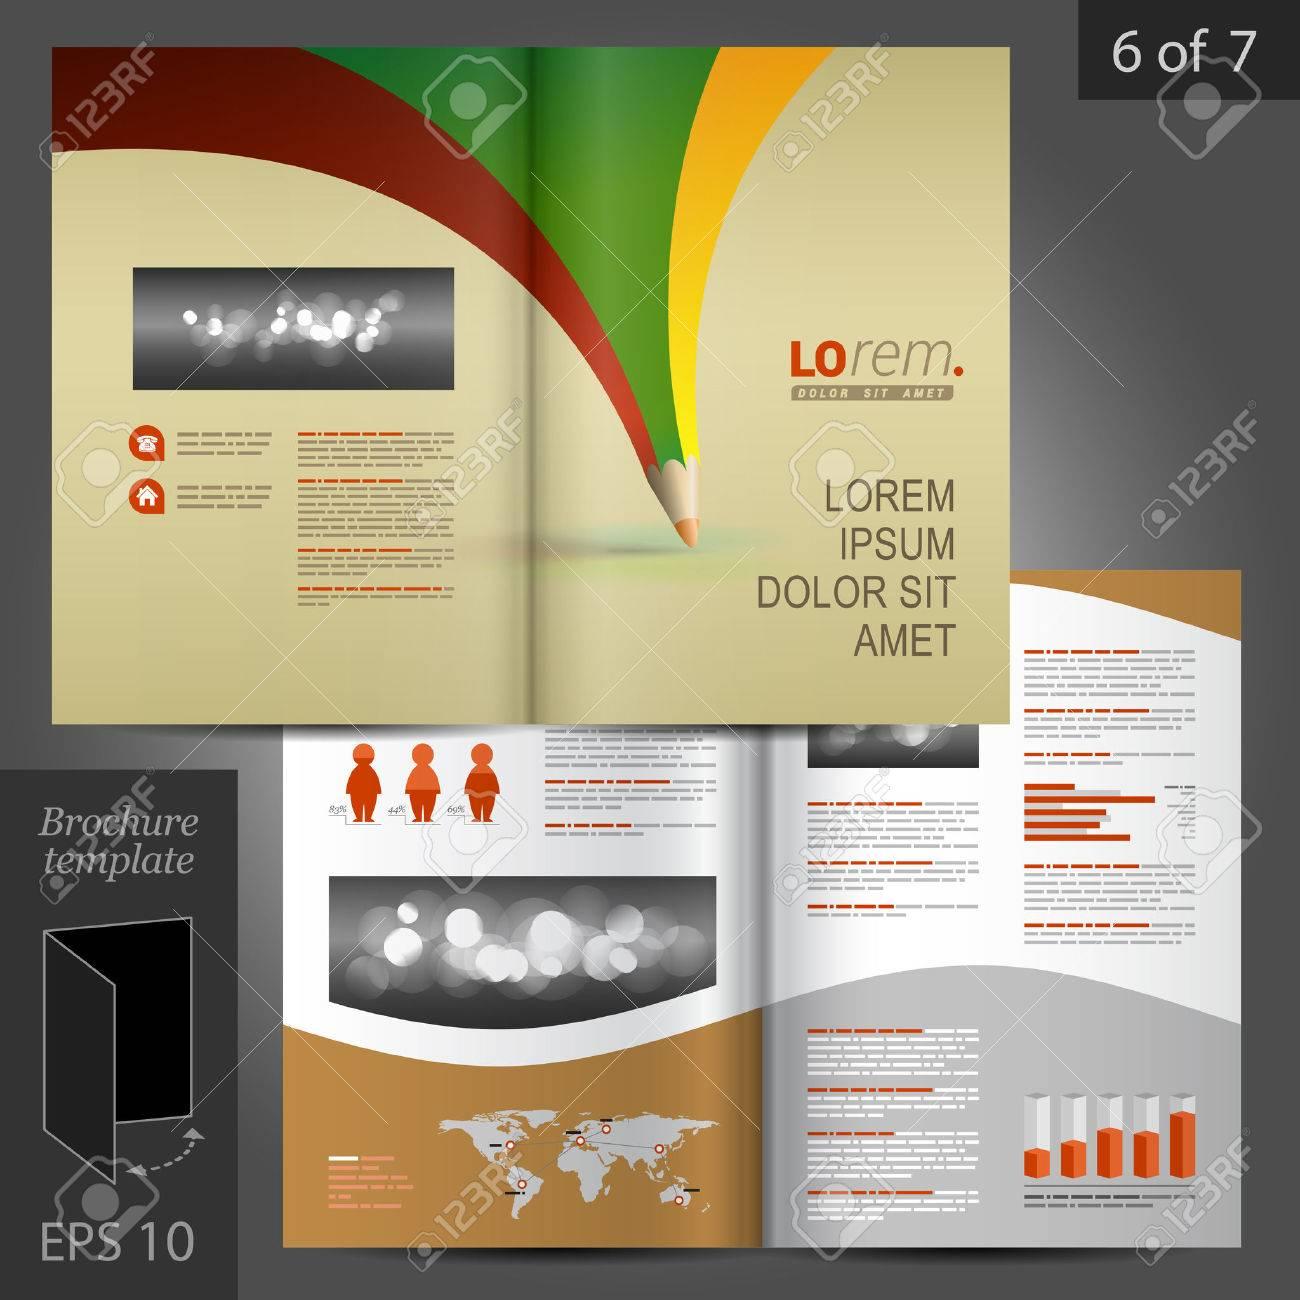 free downloadable brochure template